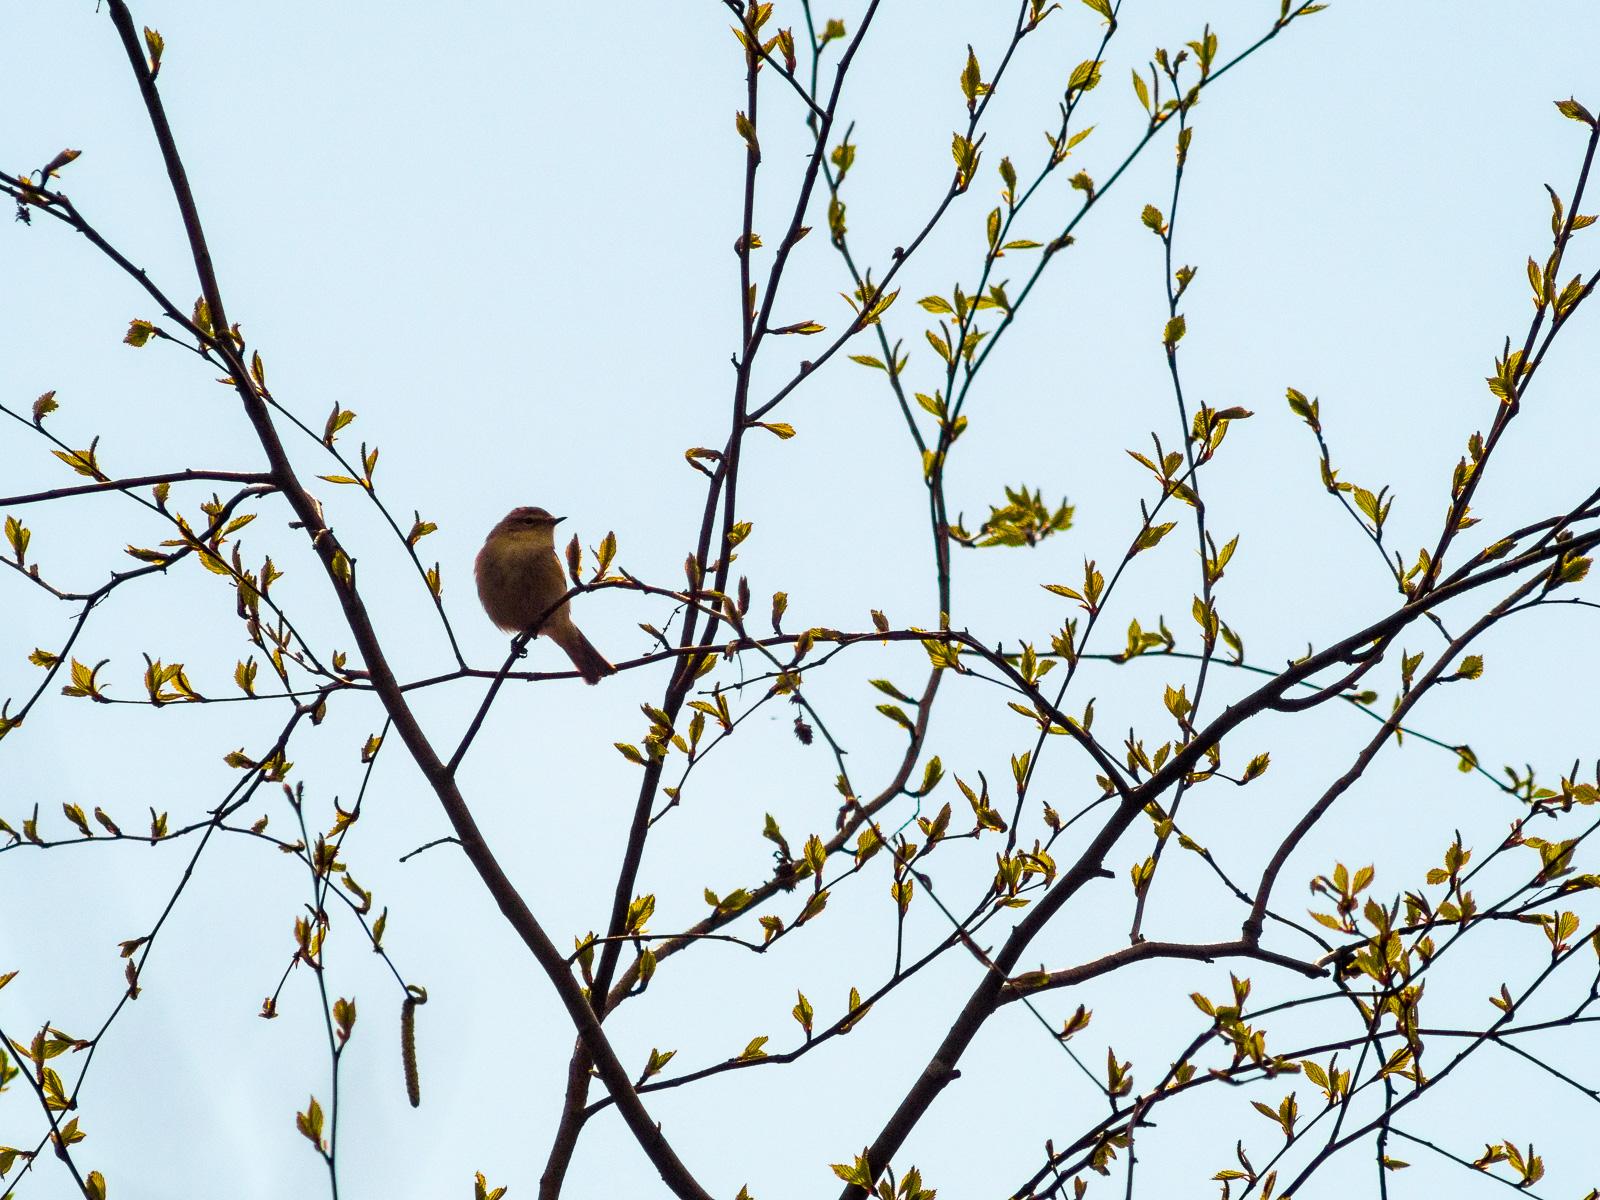 sehr kleiner Vogel in knospendem Baum